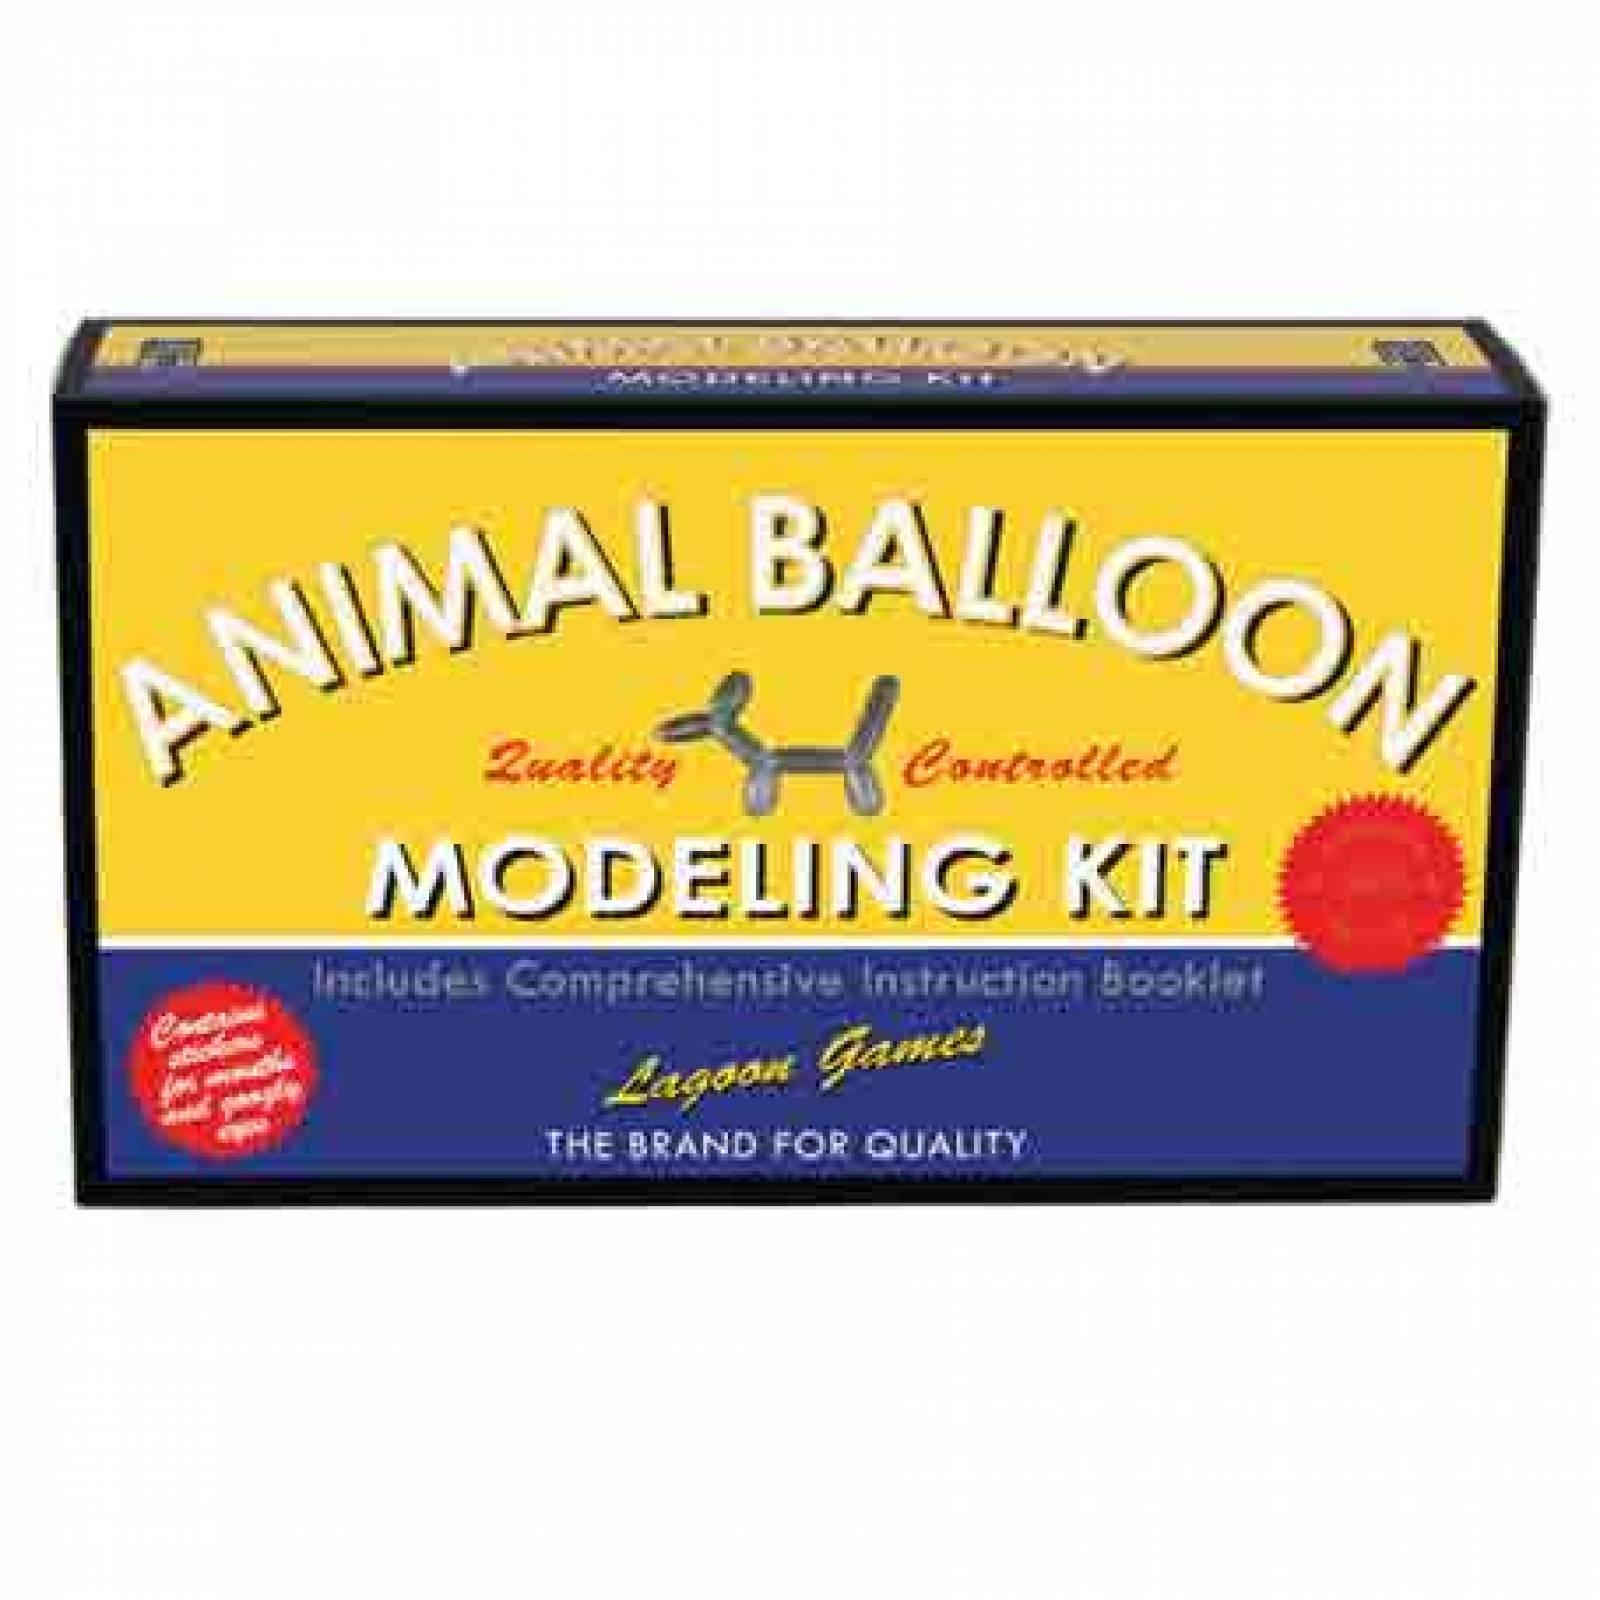 Animal Balloon Modelling Kit